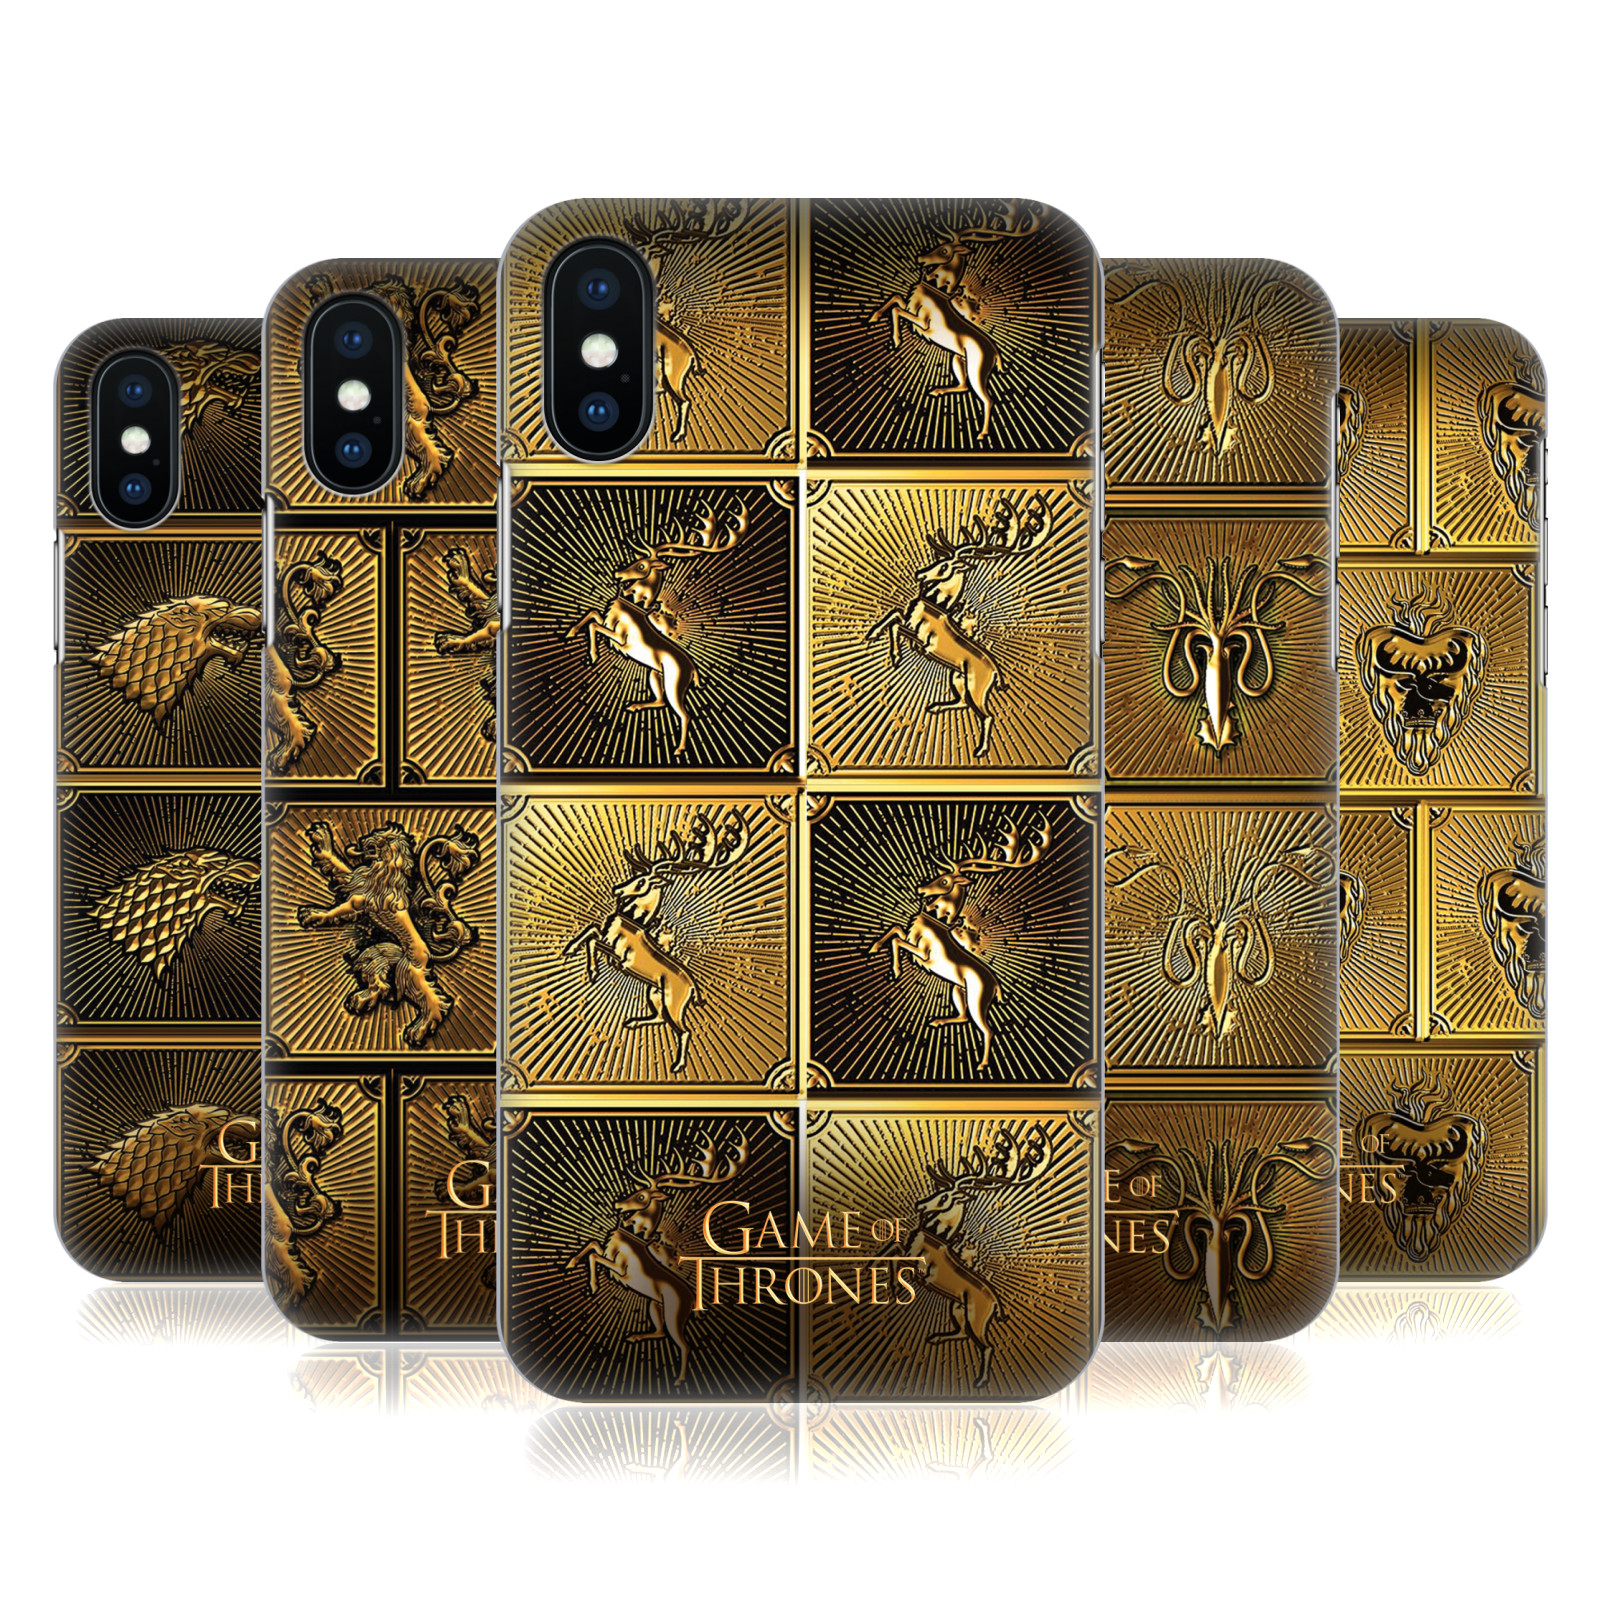 HBO Game of Thrones Golden Sigils